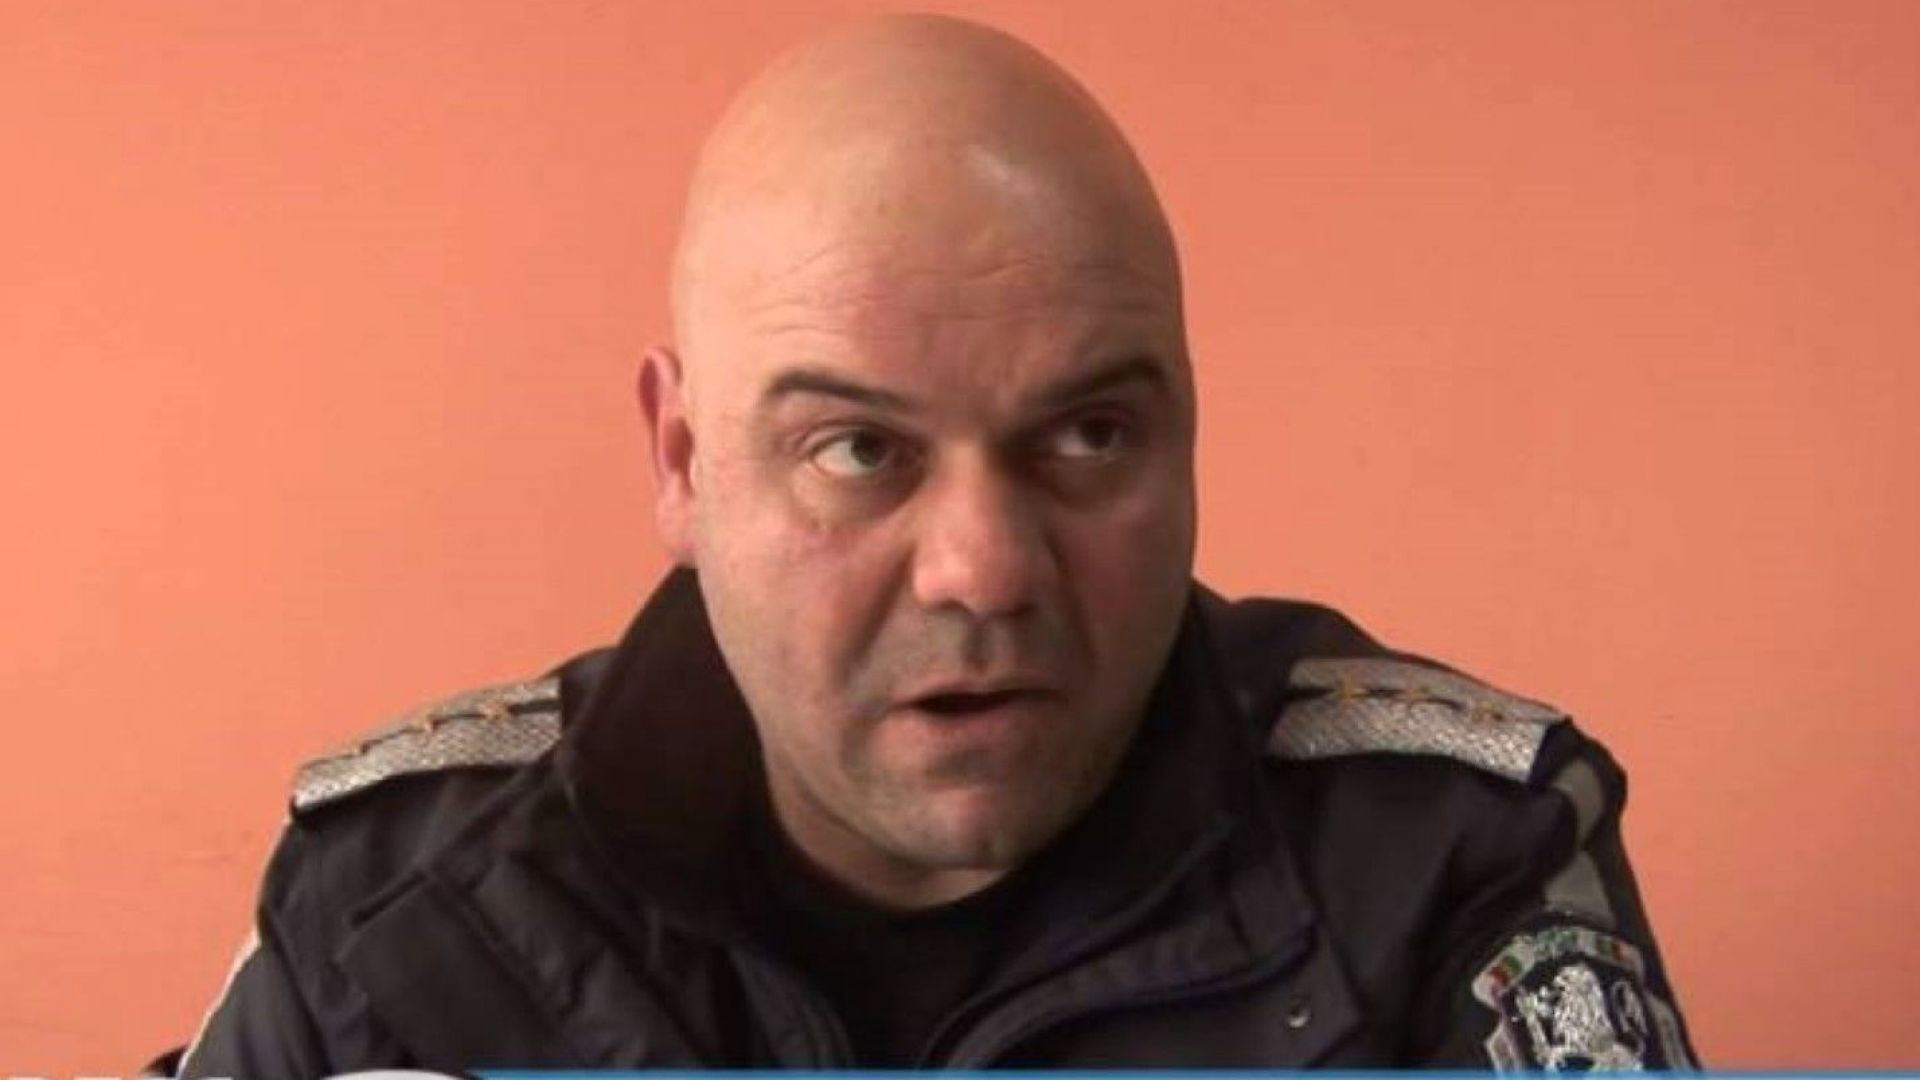 Тодор Николов се е самоубил, според топ криминалист